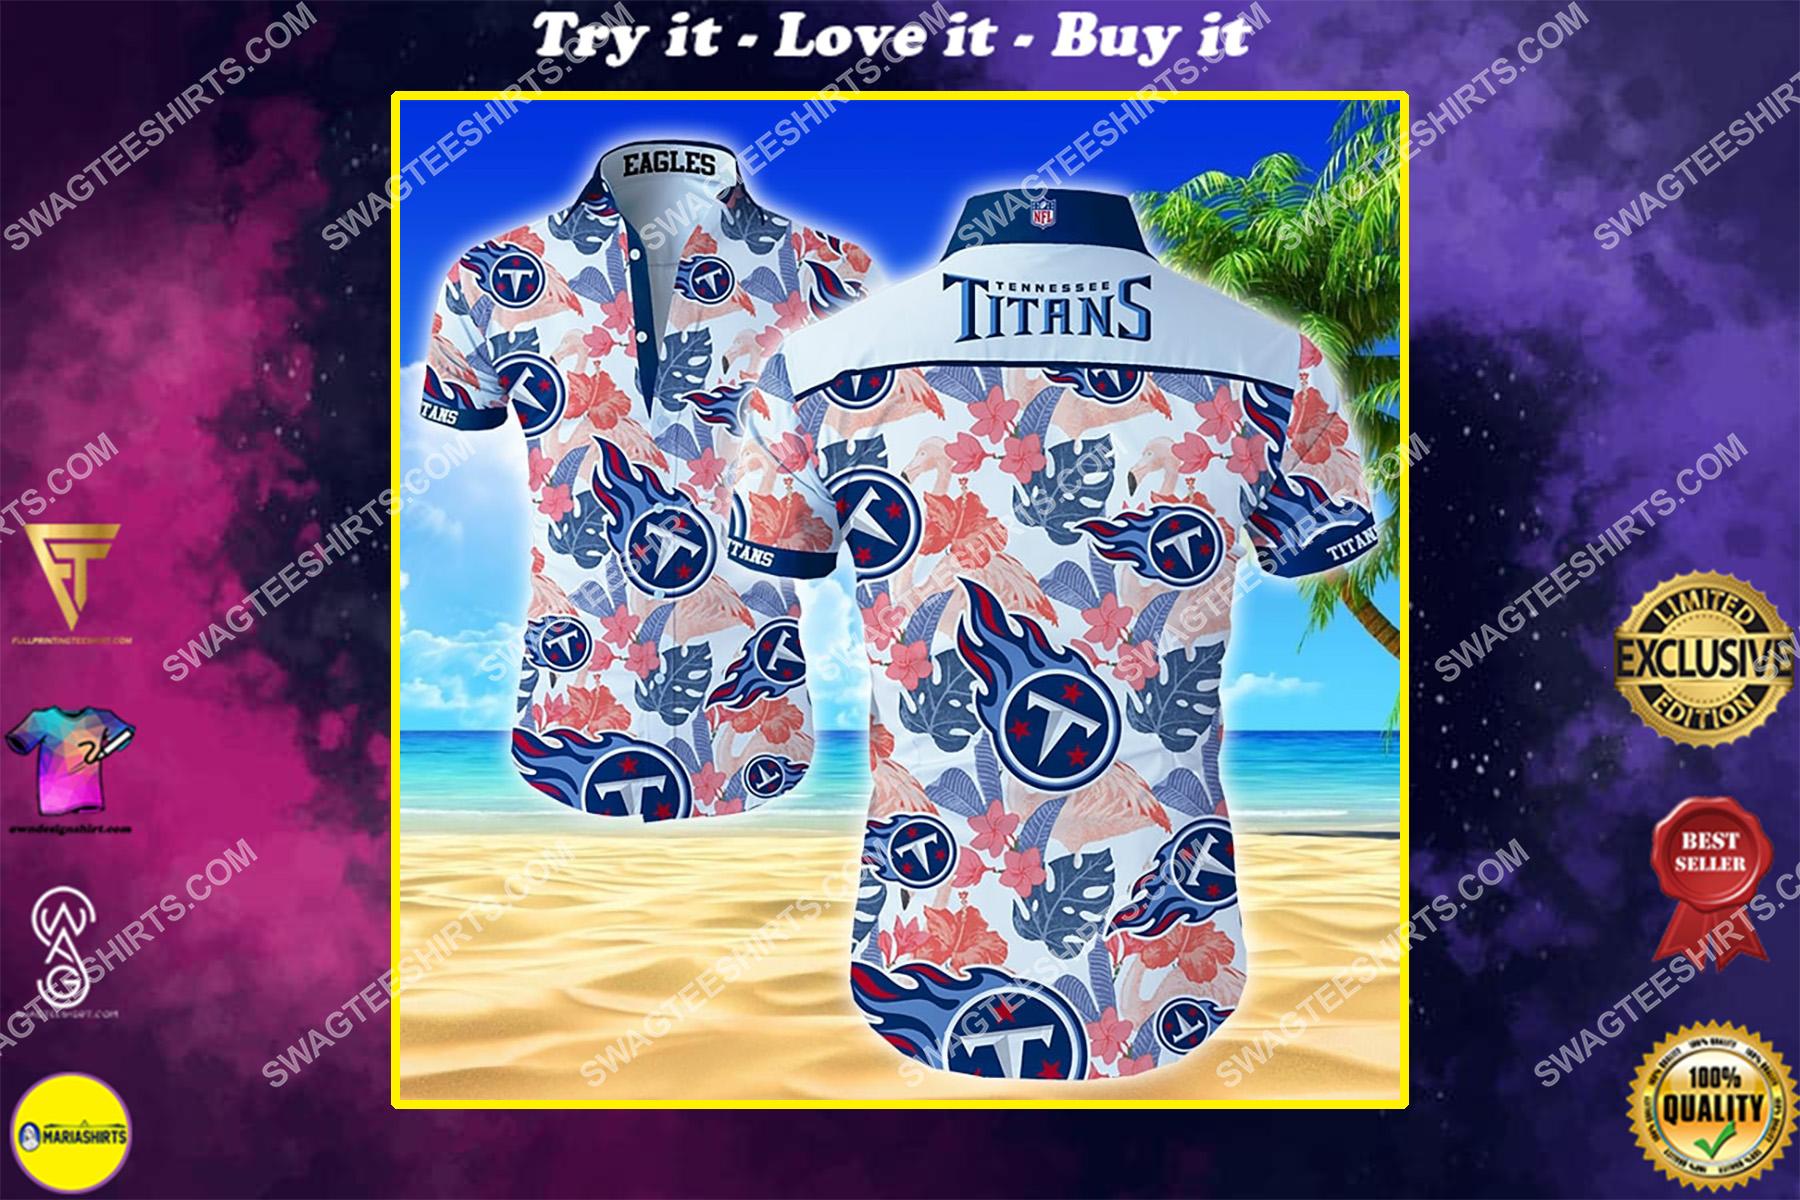 tropical tennessee titans football team hawaiian shirt